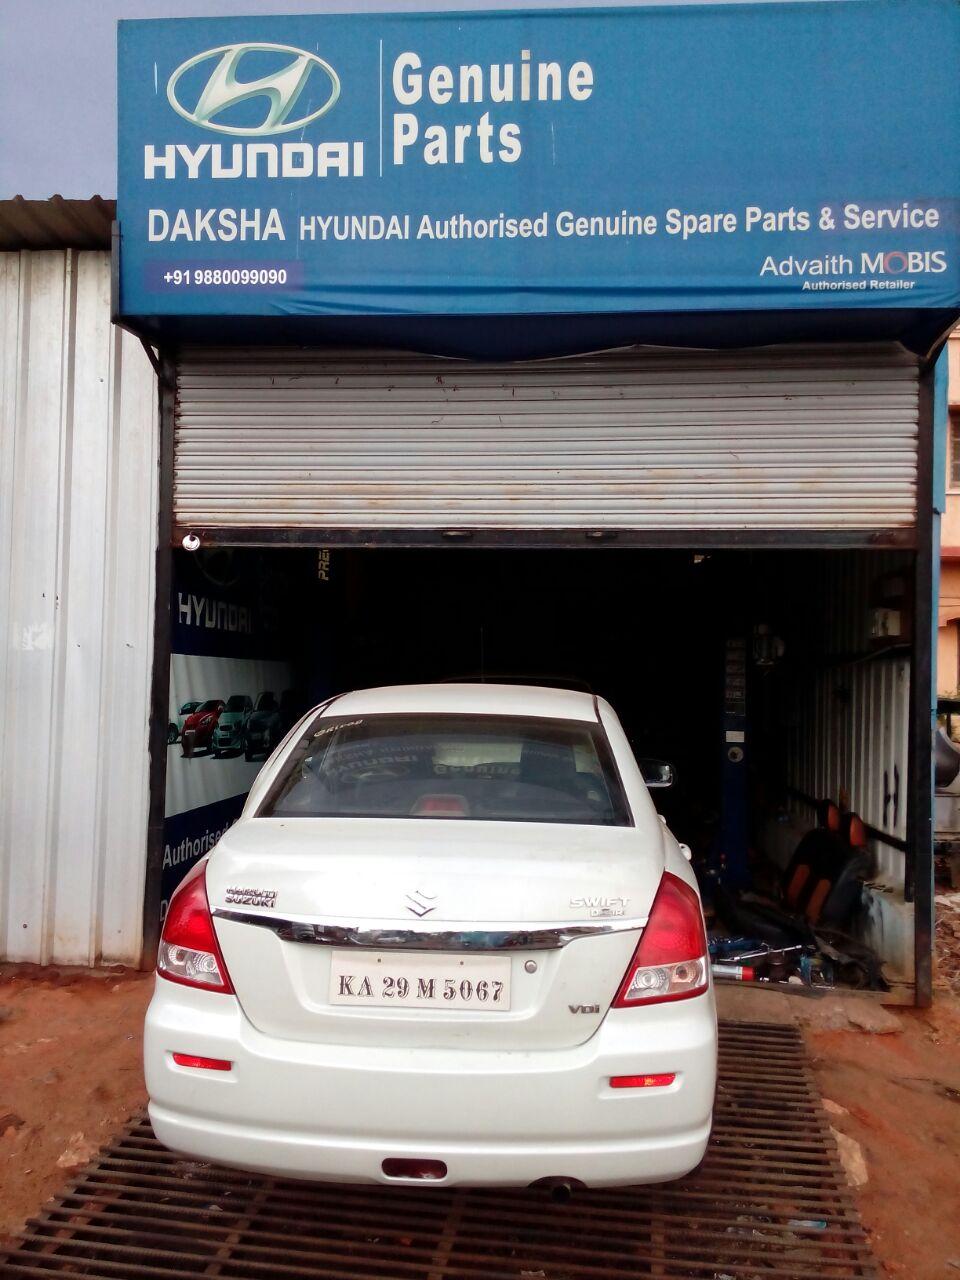 Daksha Enterprises